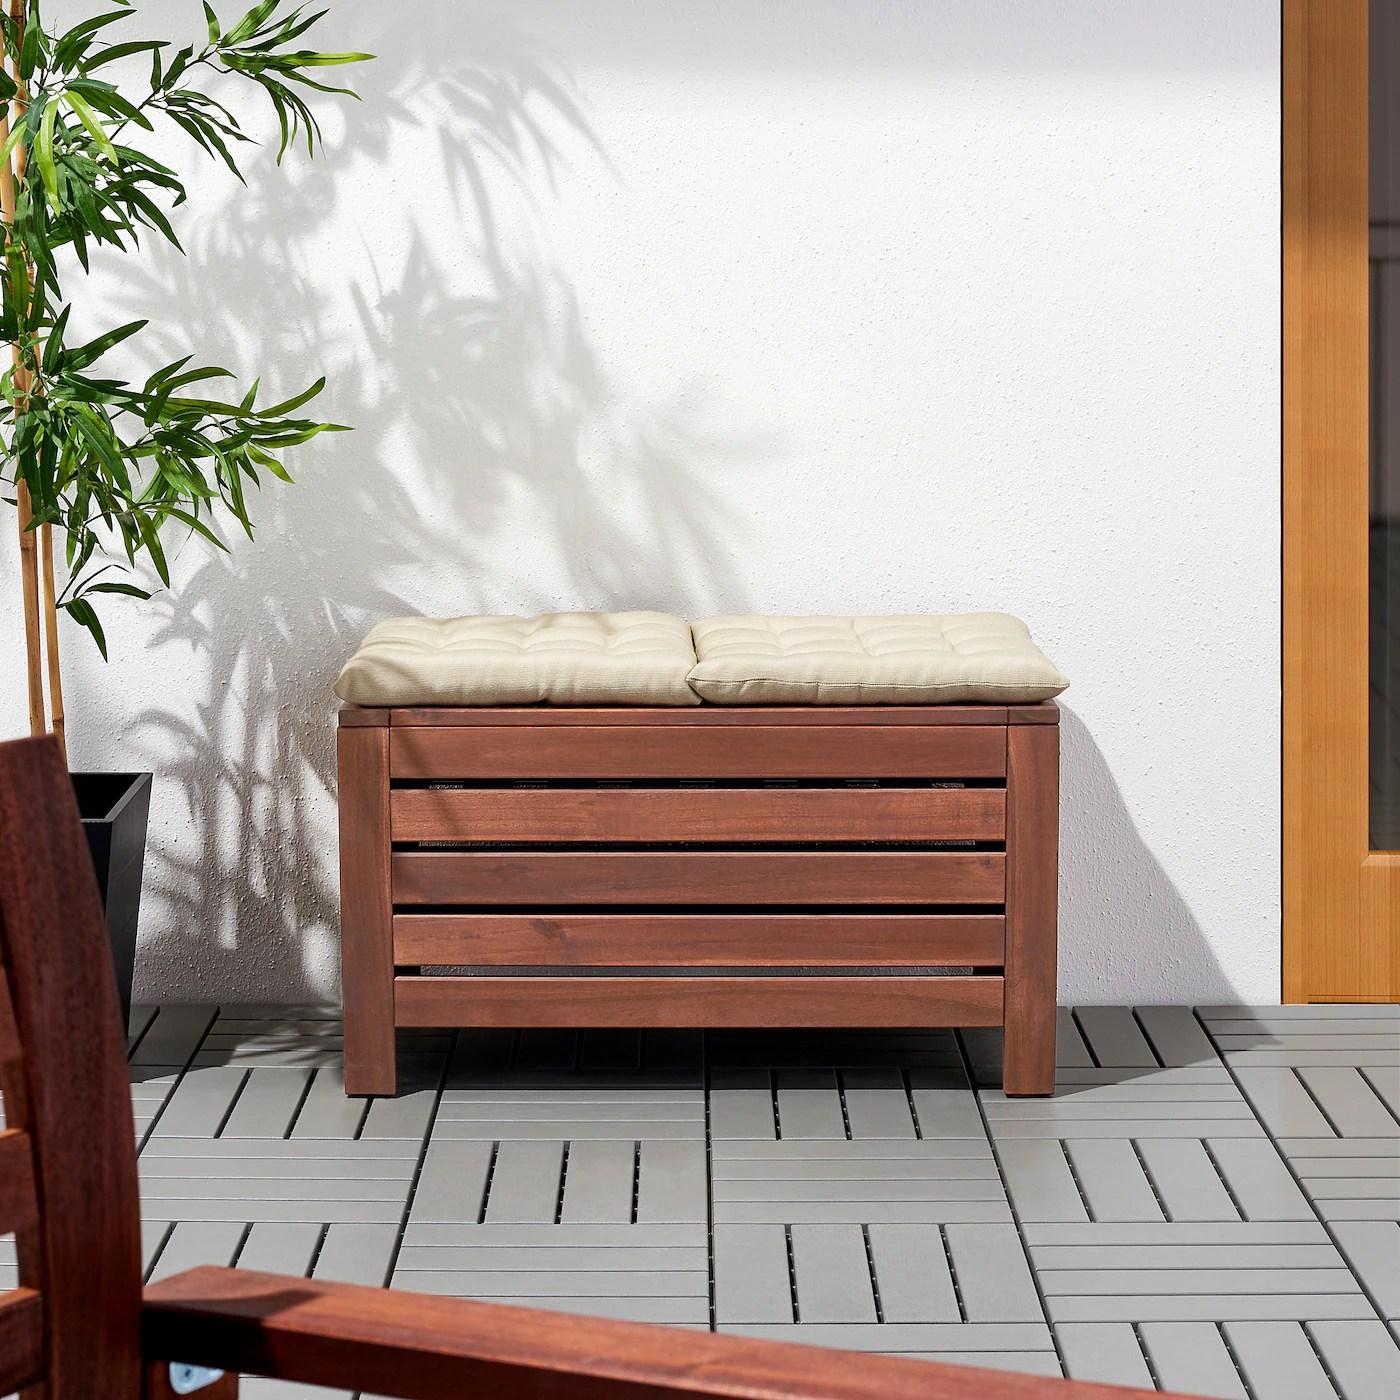 Applaro Storage Bench Outdoor Brown Stained Brown Width 31 1 2 Ikea